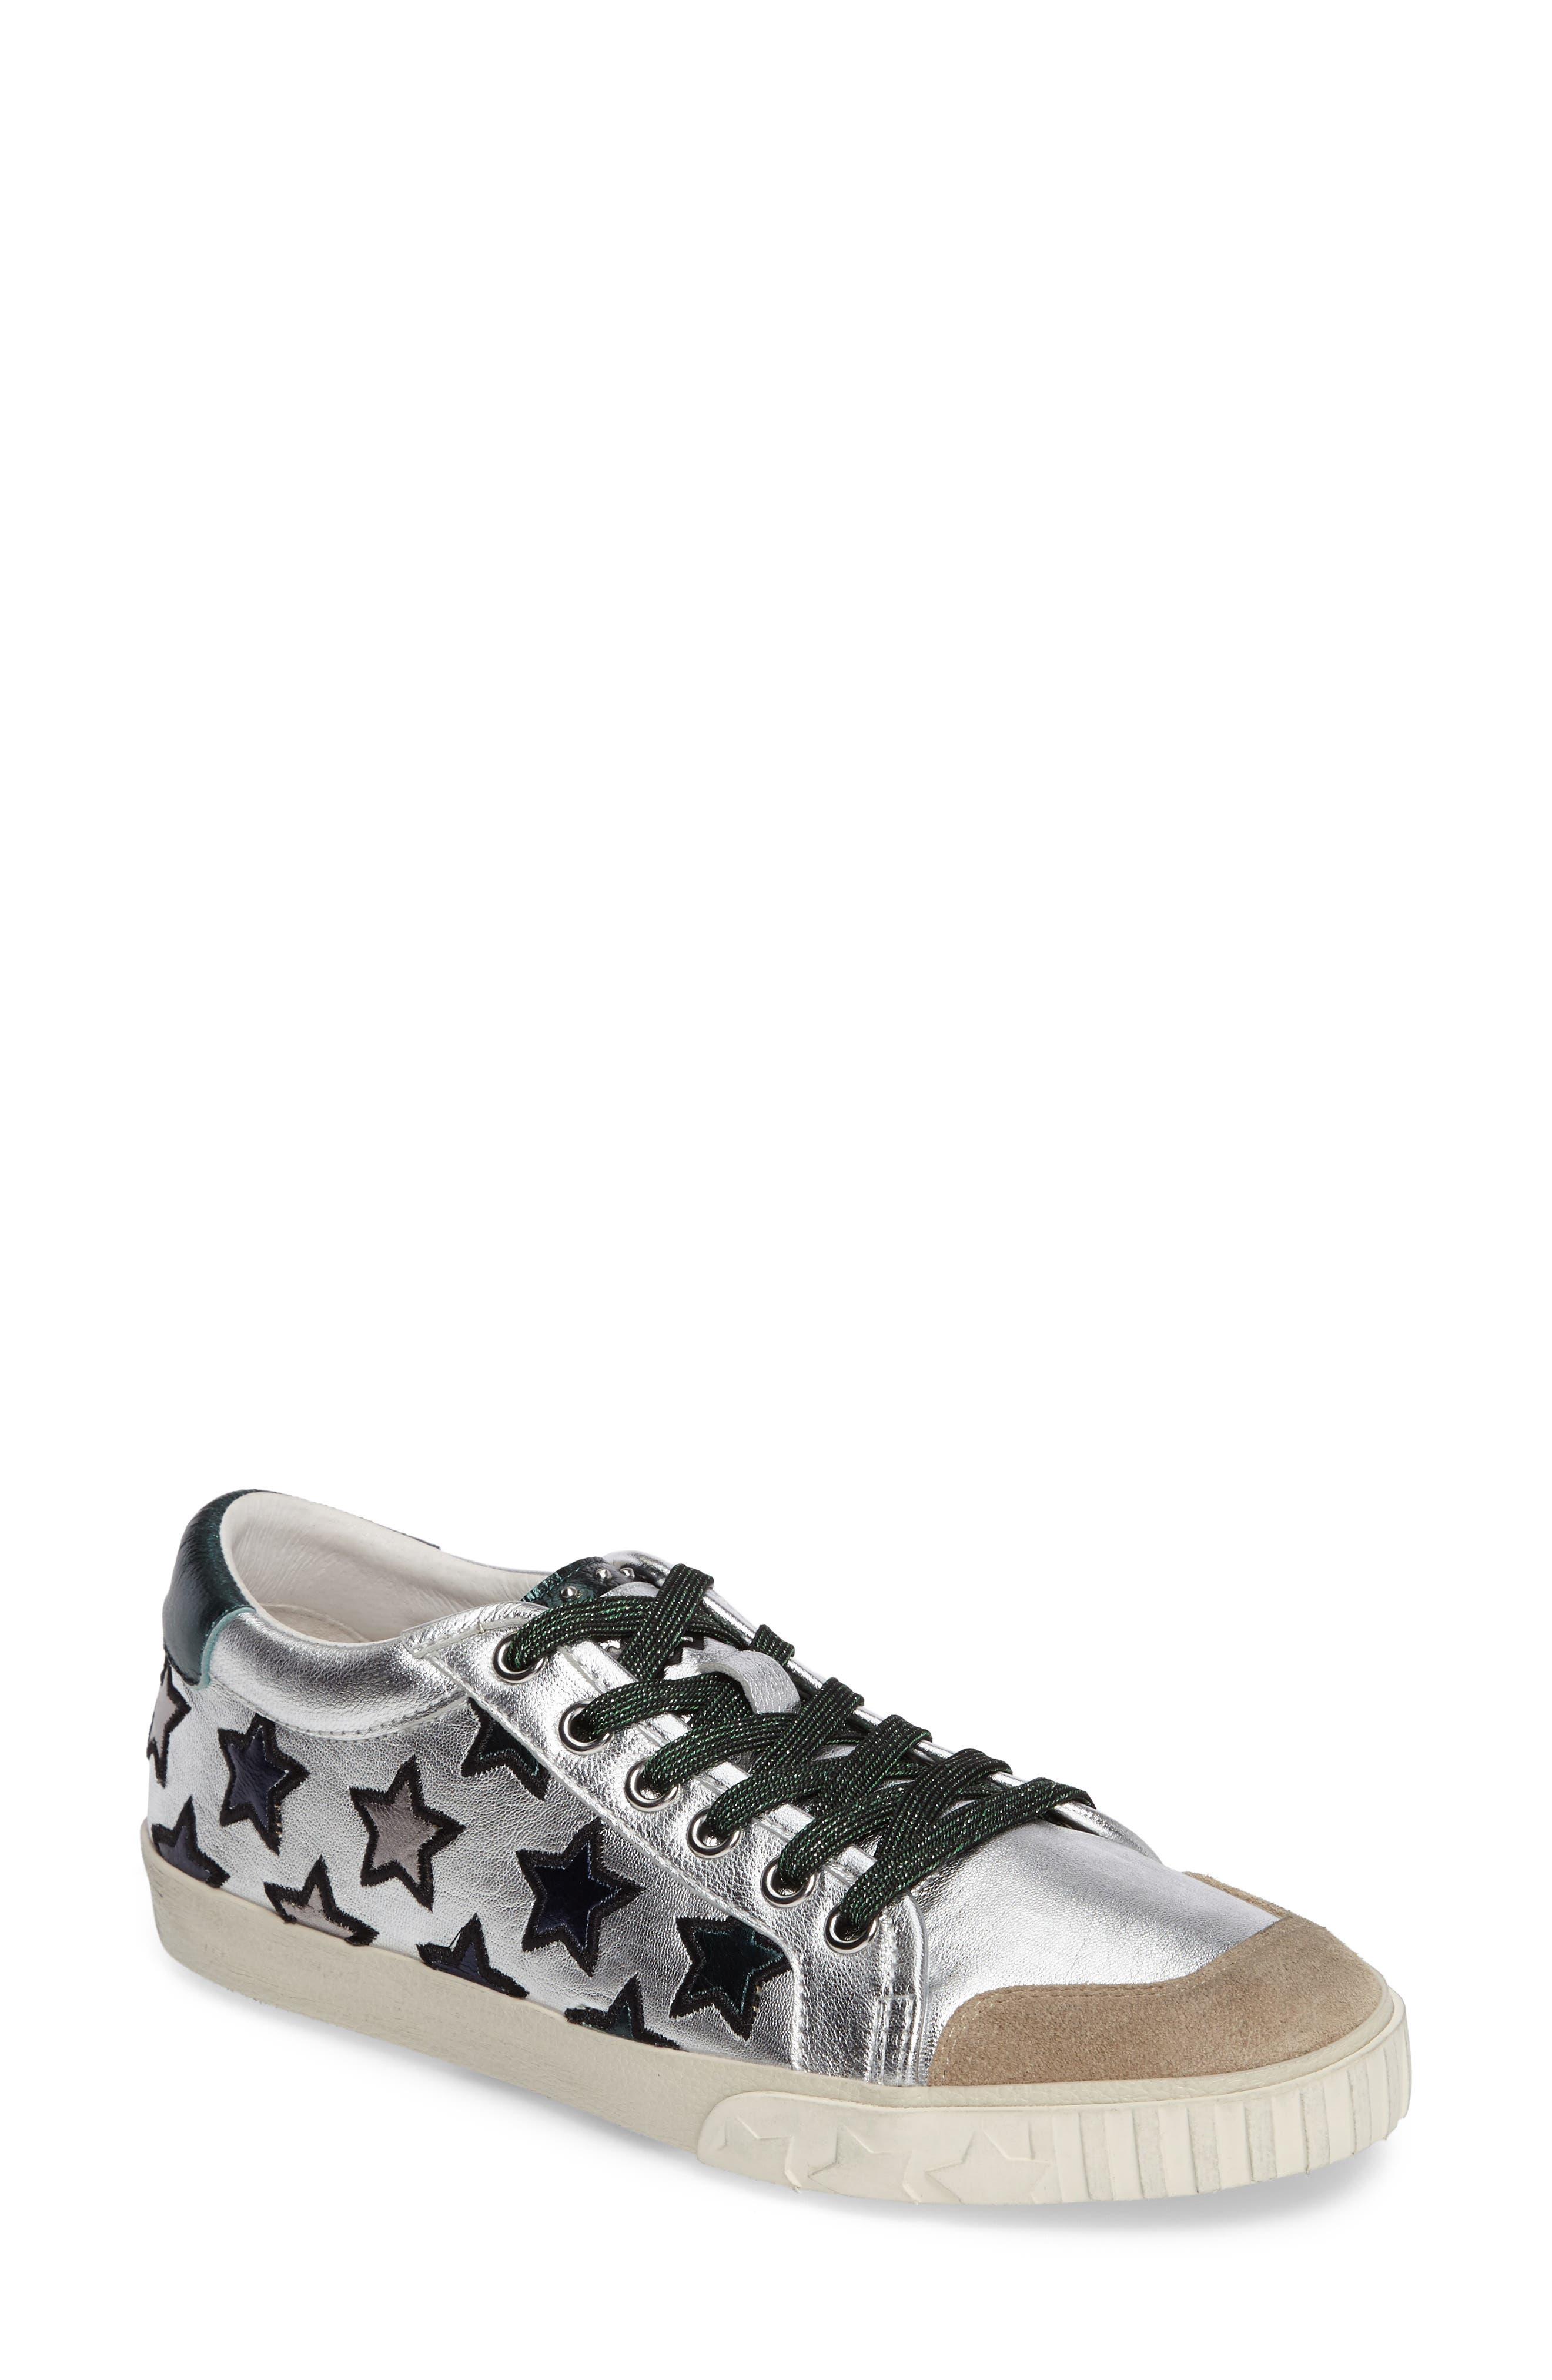 Majestic Sneaker,                         Main,                         color, 190